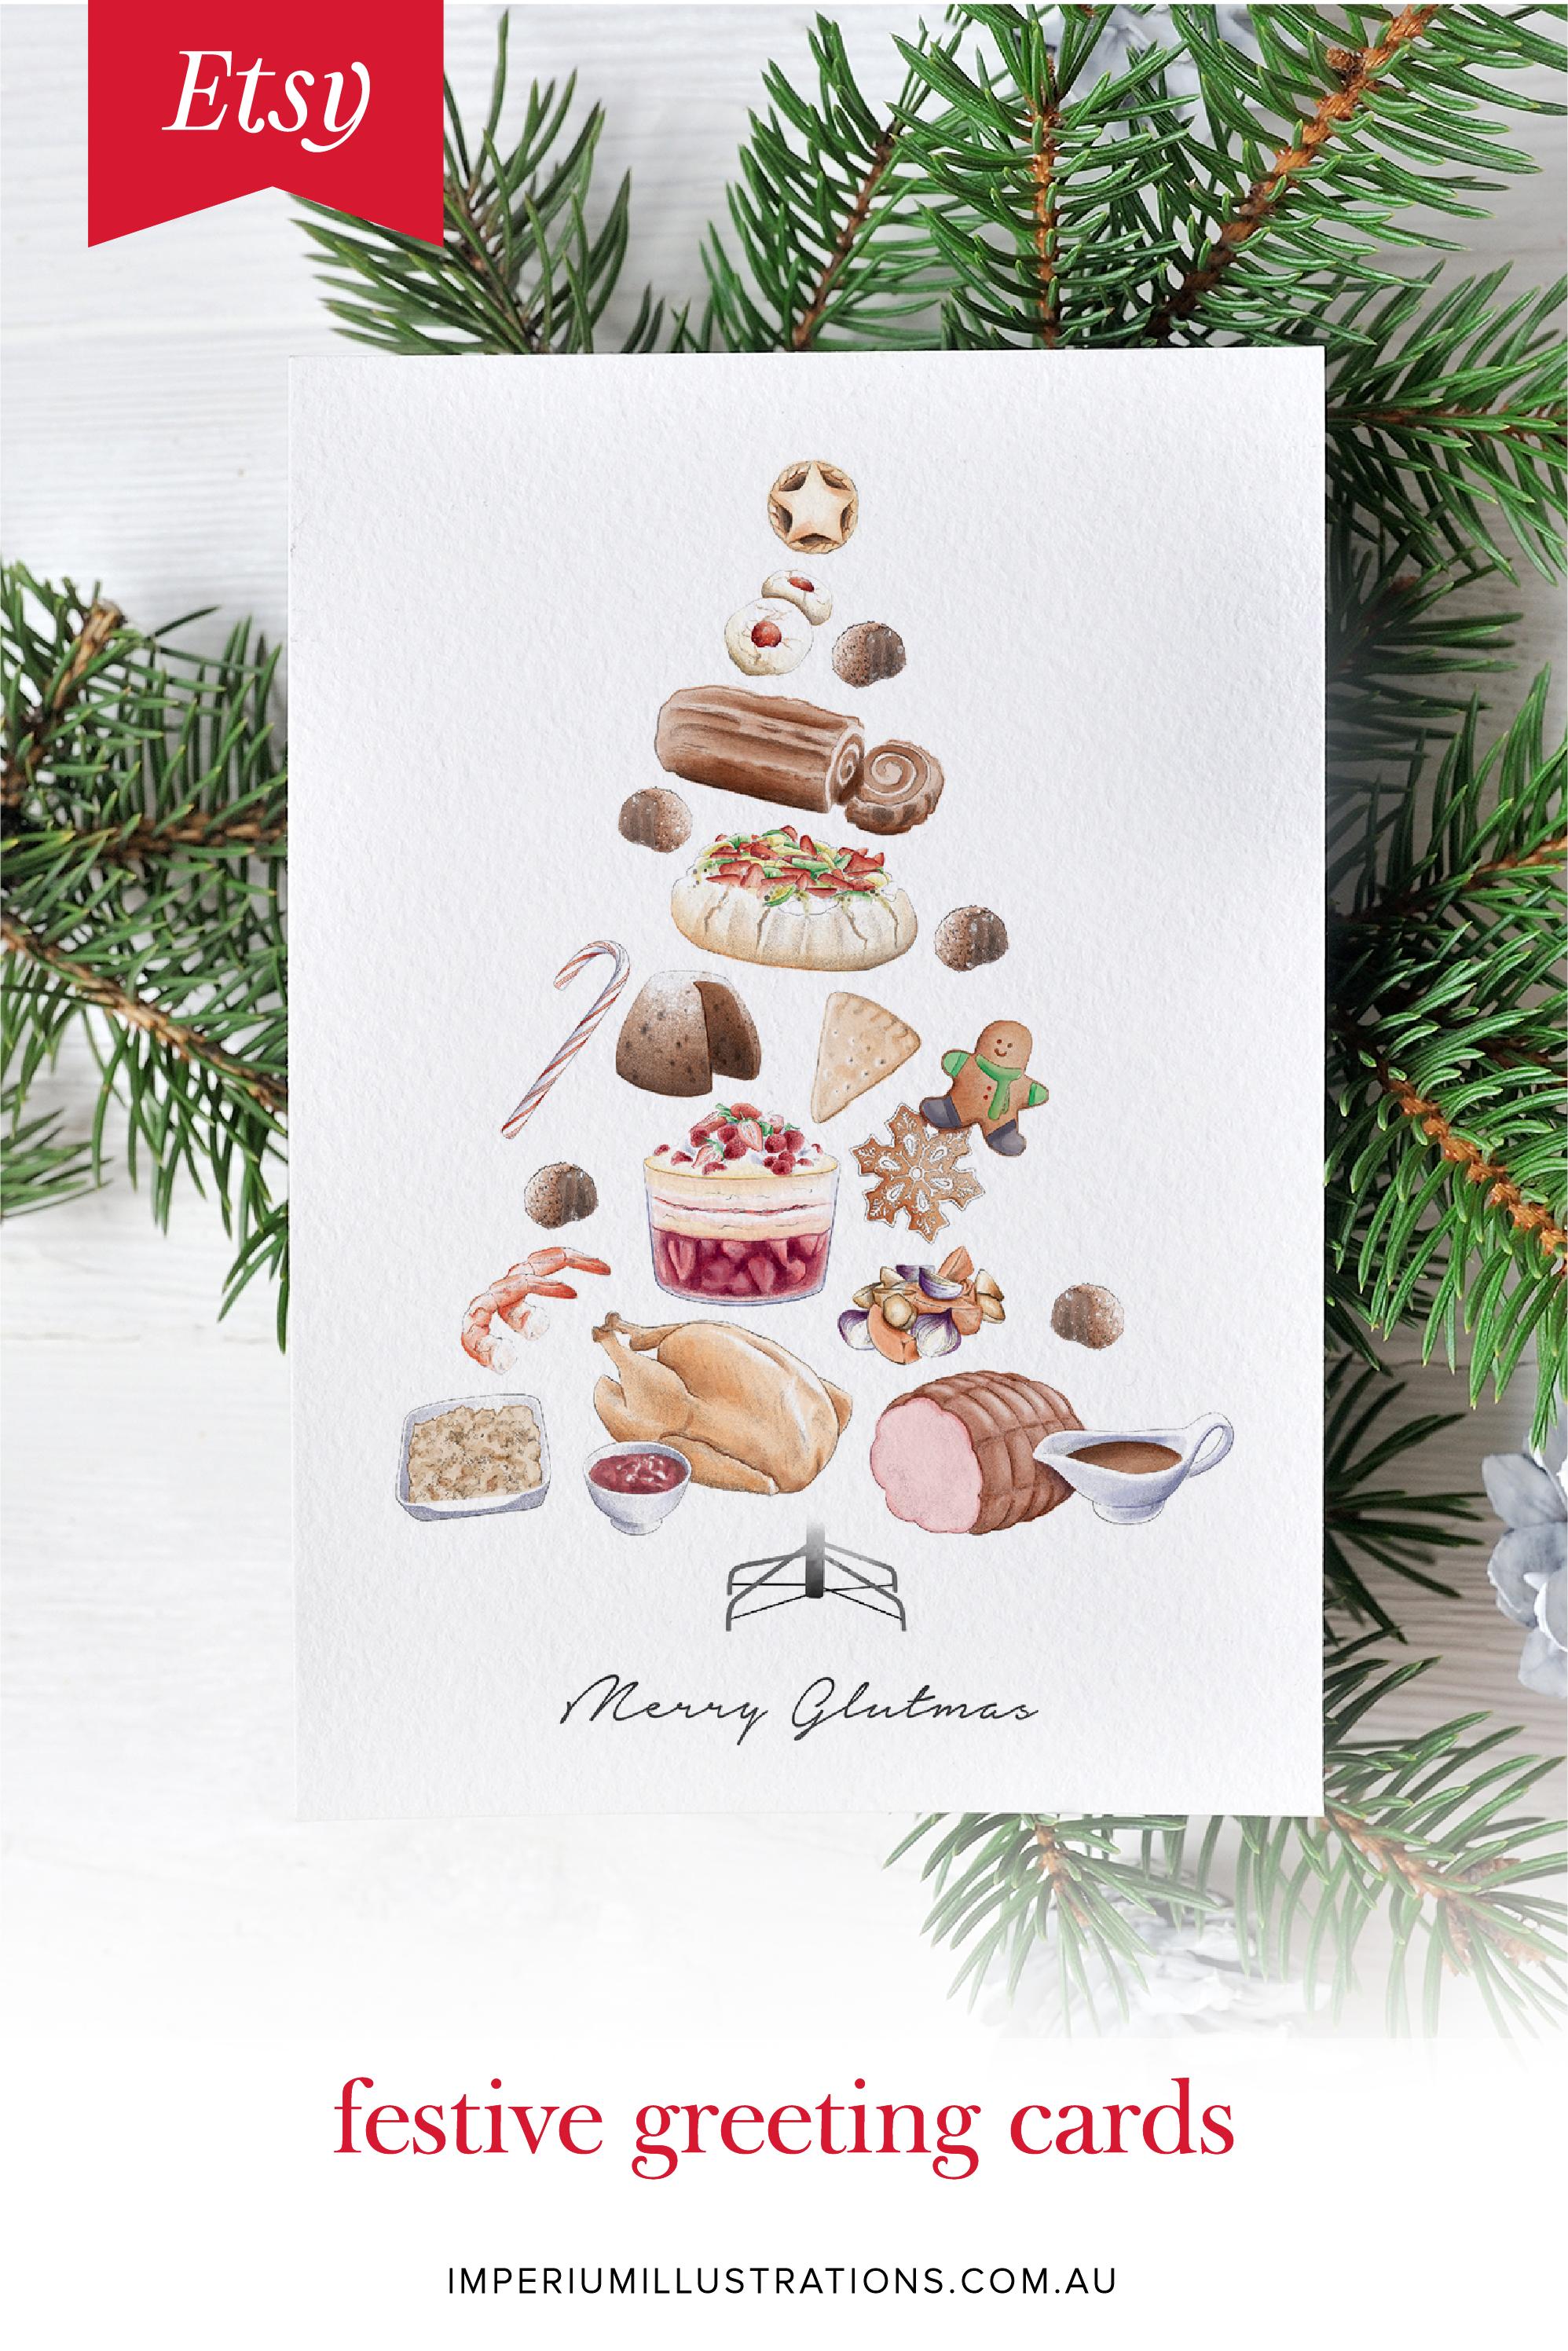 Funny Christmas Card Christmas Tree Card Modern Christmas Card Christmas Food Card Christmas Dinner Christmas Tree Cards Festive Cards Funny Christmas Cards